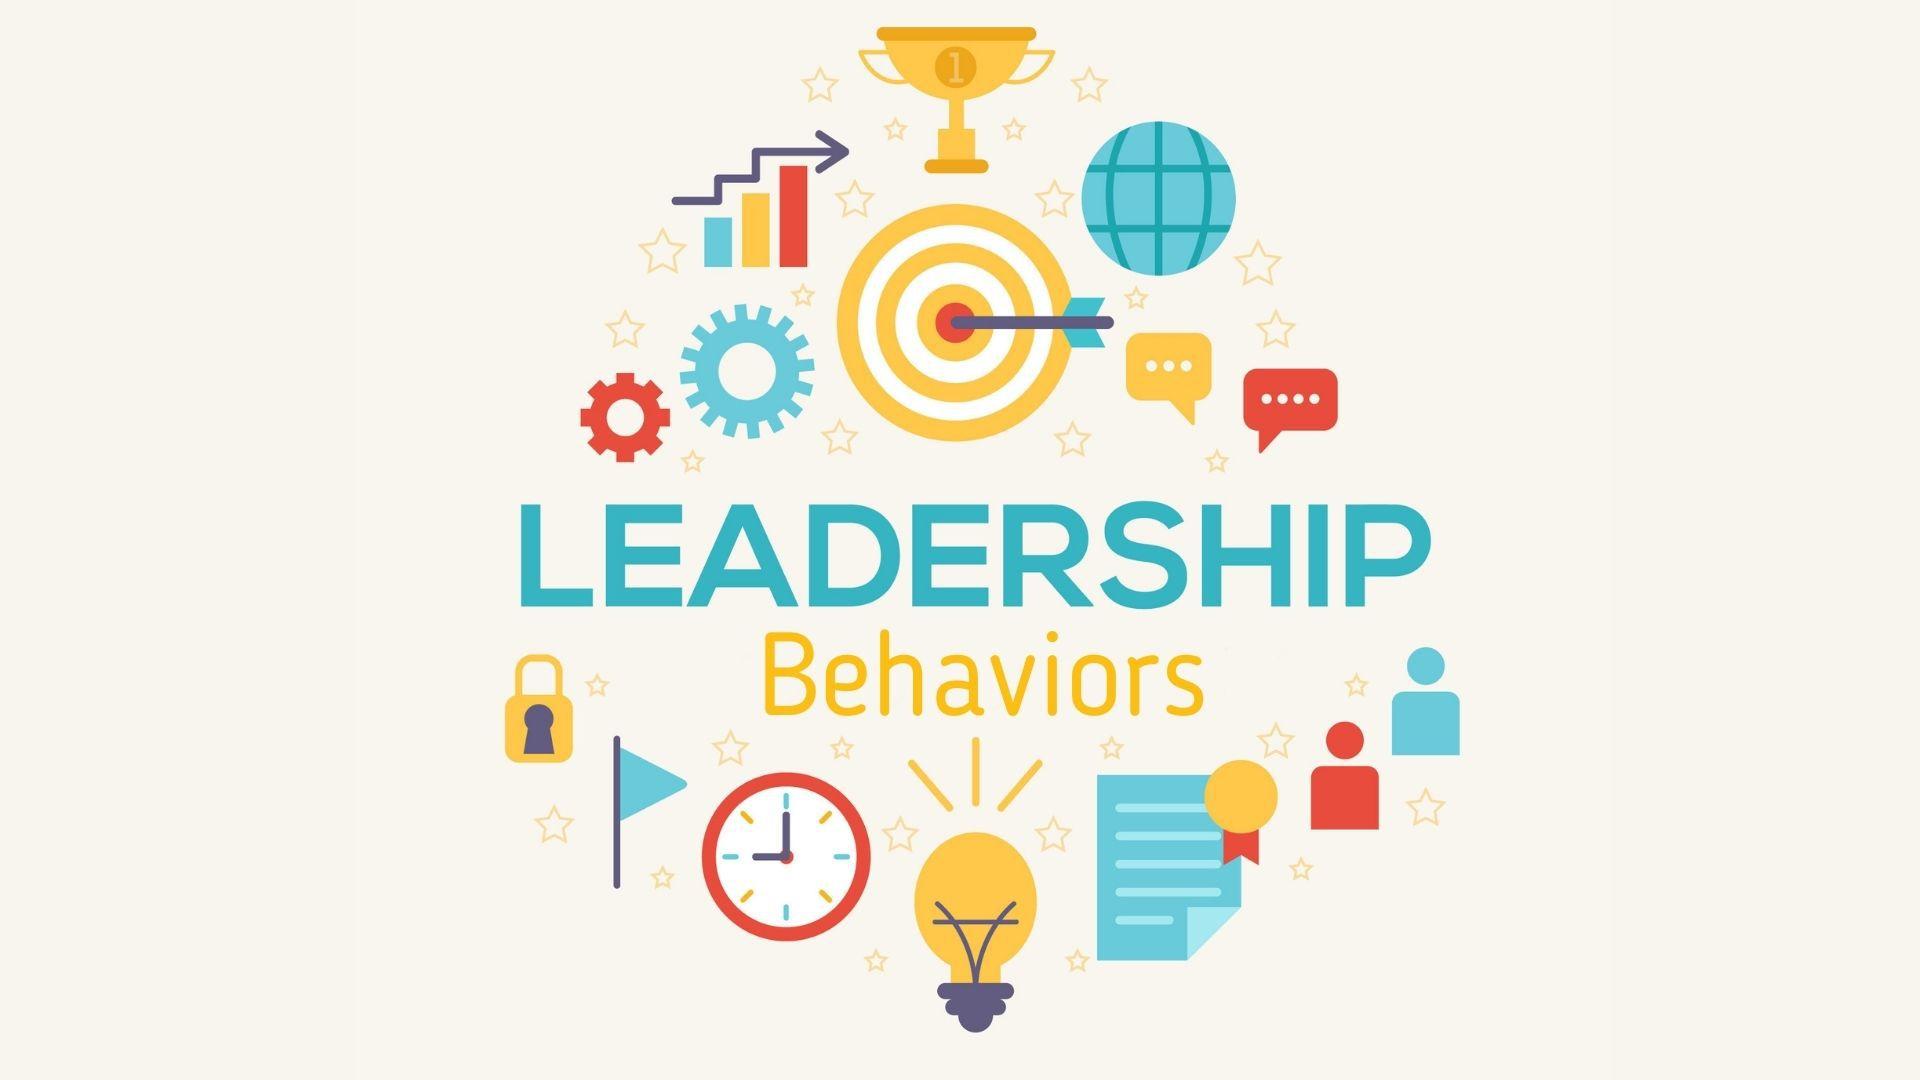 10 Leadership Behaviors Every Leader should Possess